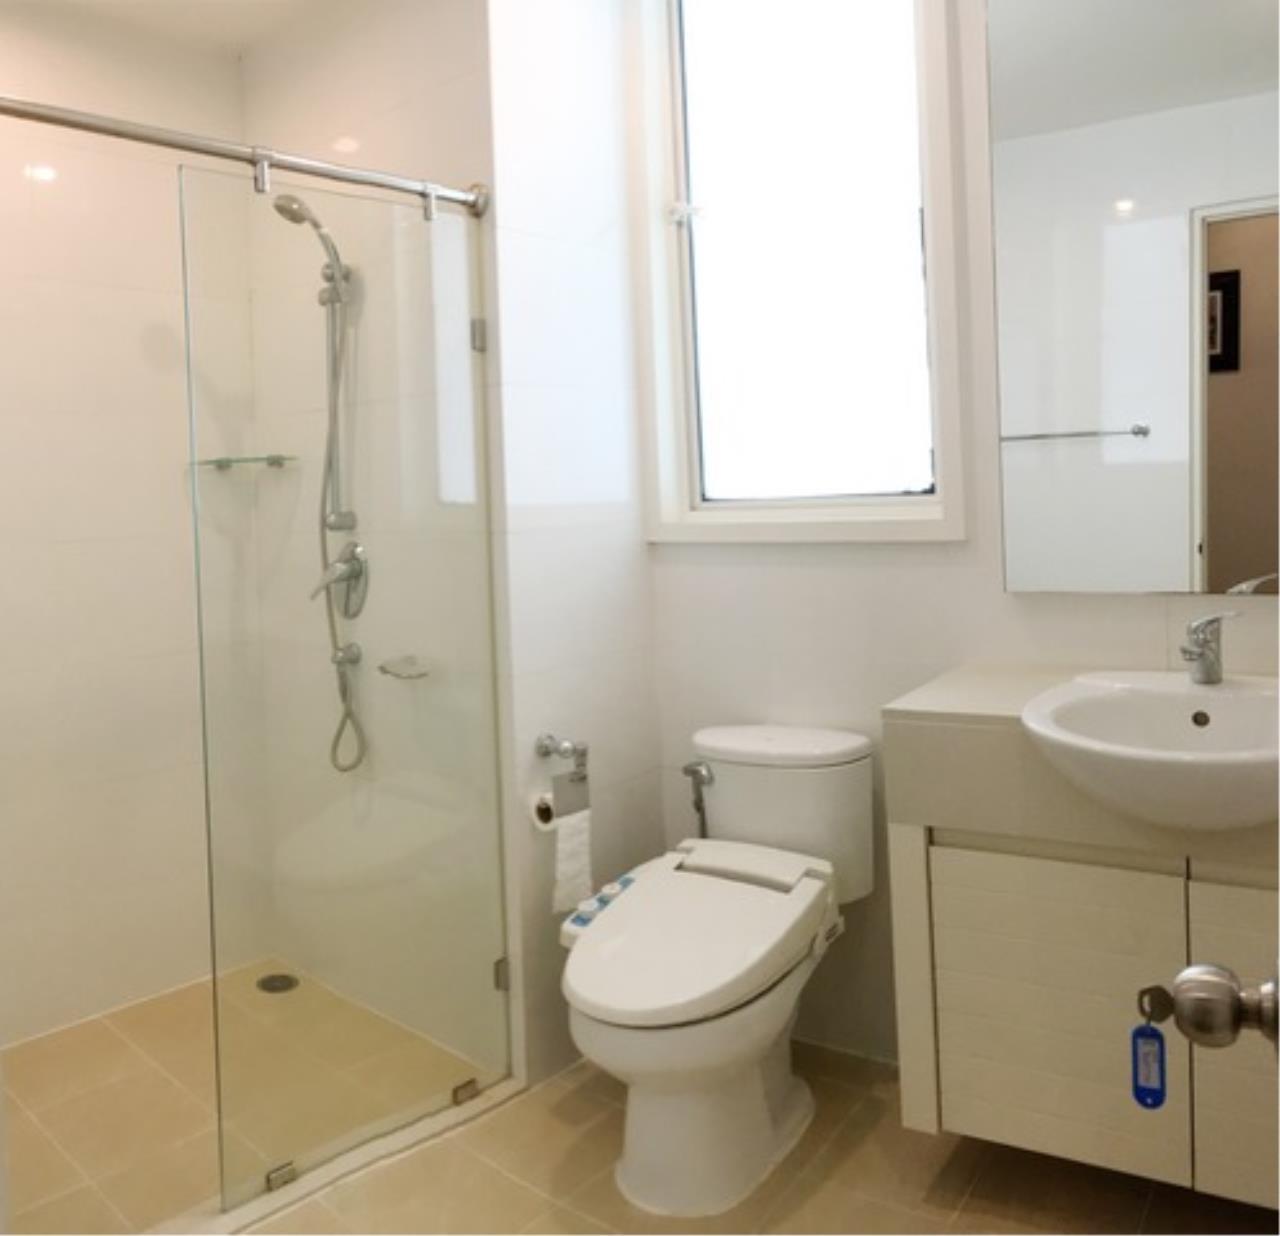 Ta (+66 9 5935 1592) Agency's SALE Condo Siri Residence by Sansiri 2 Bed near BTS Prompong Thonglor Emporium Best Price (163,000B/sqm) 21